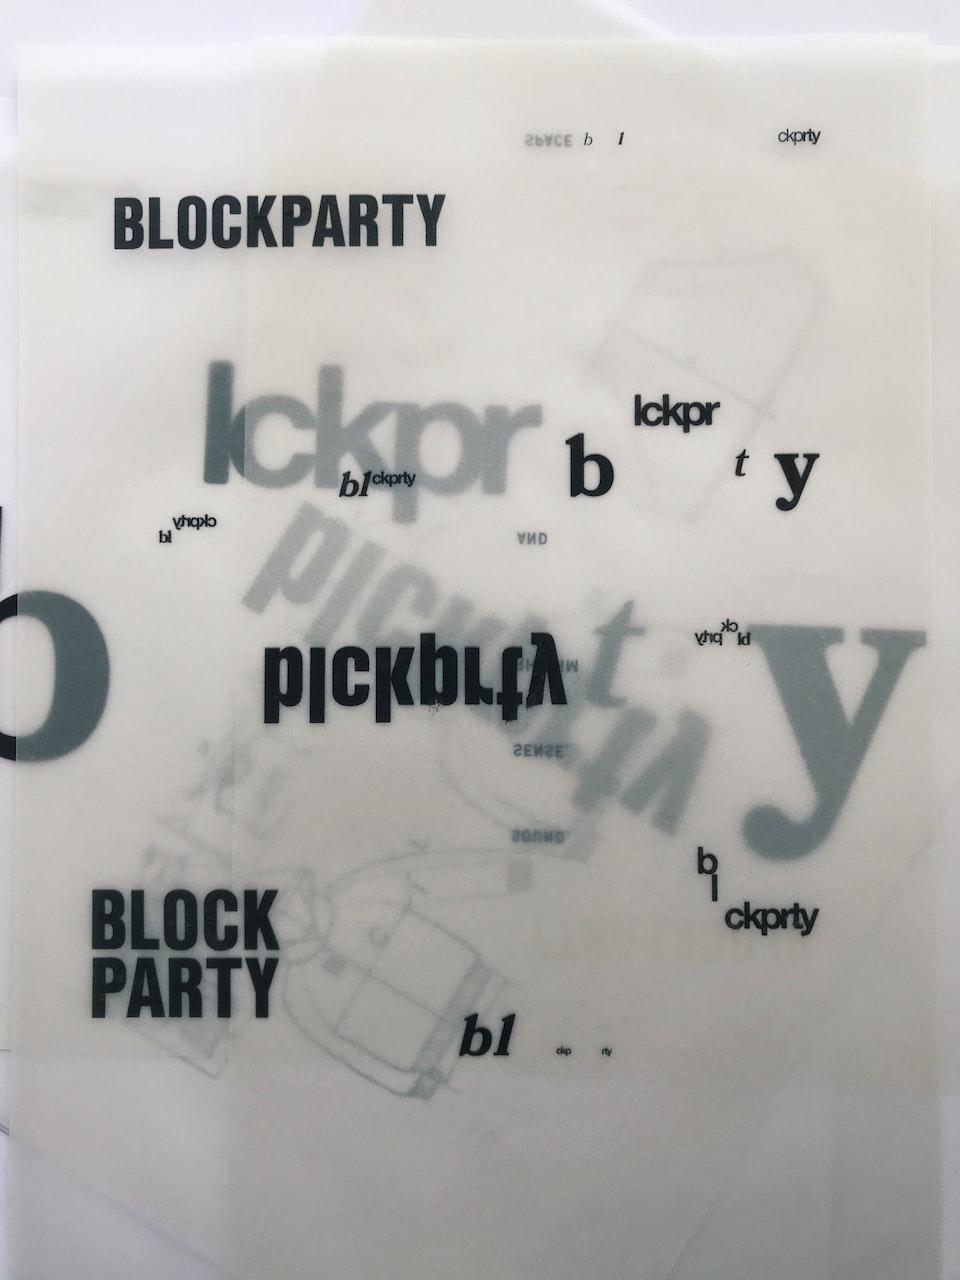 Blockparty photo 10